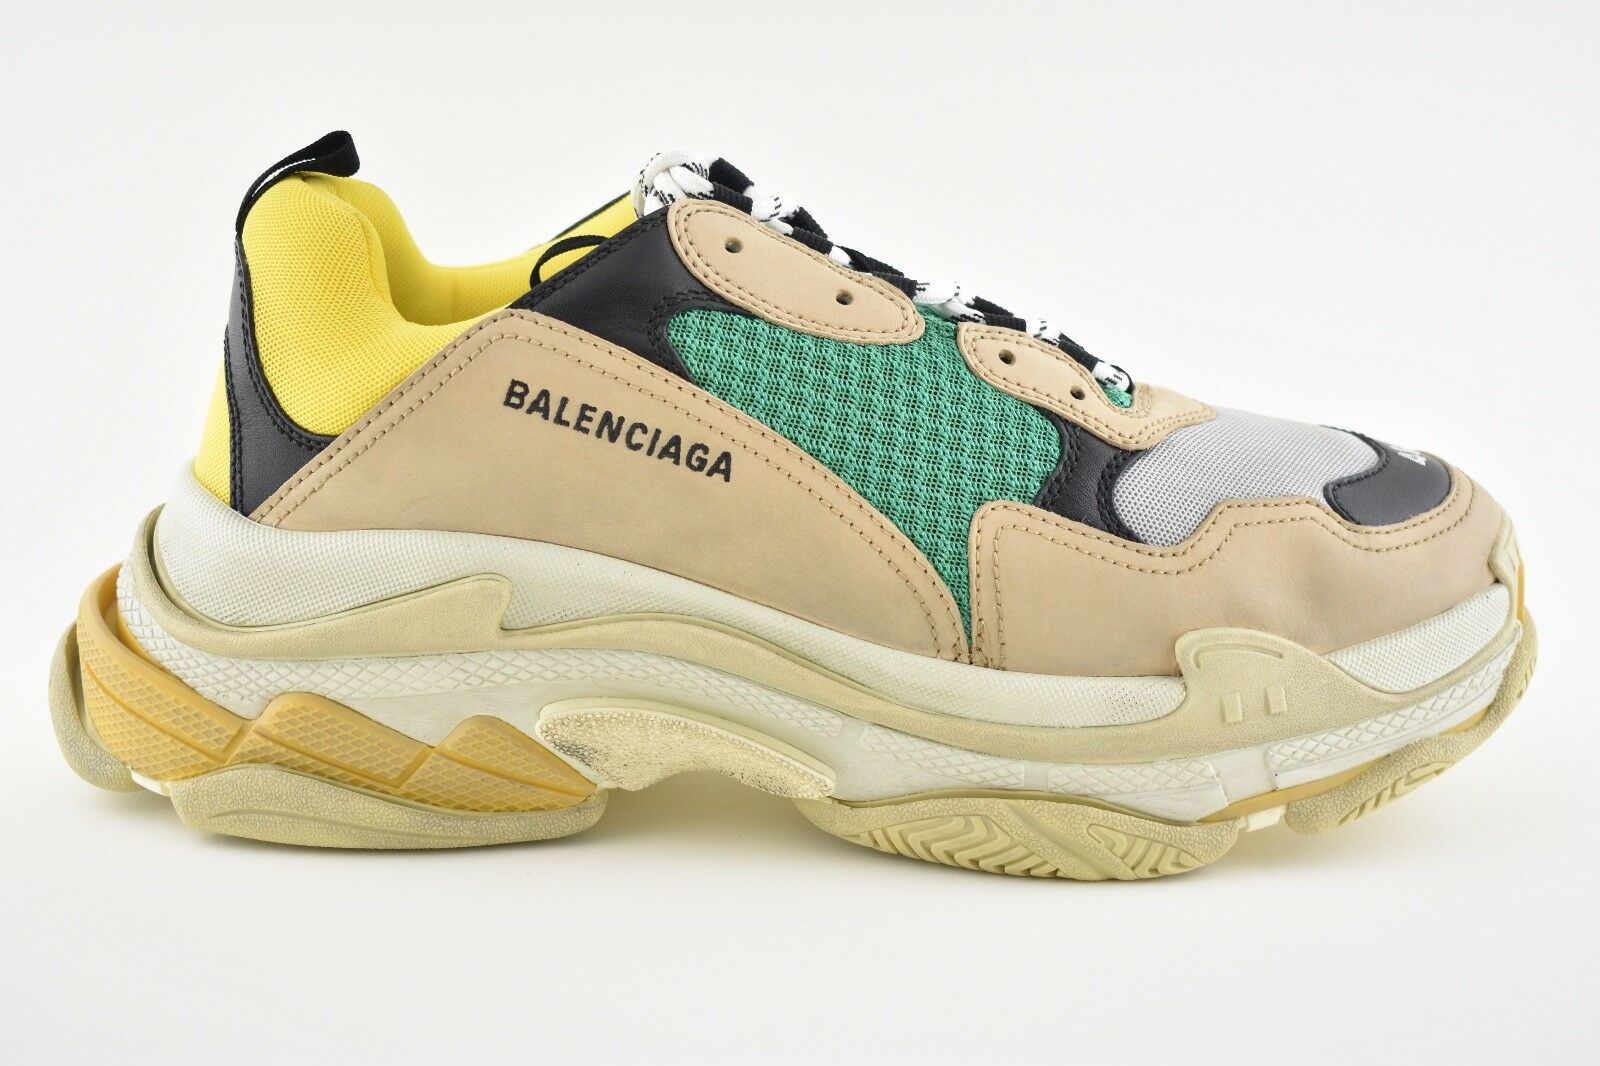 NIB NIB NIB Balenciaga Triple S Beige verde giallo Speed Flat scarpe da ginnastica Trainer 44 Uomo 11 2779a7